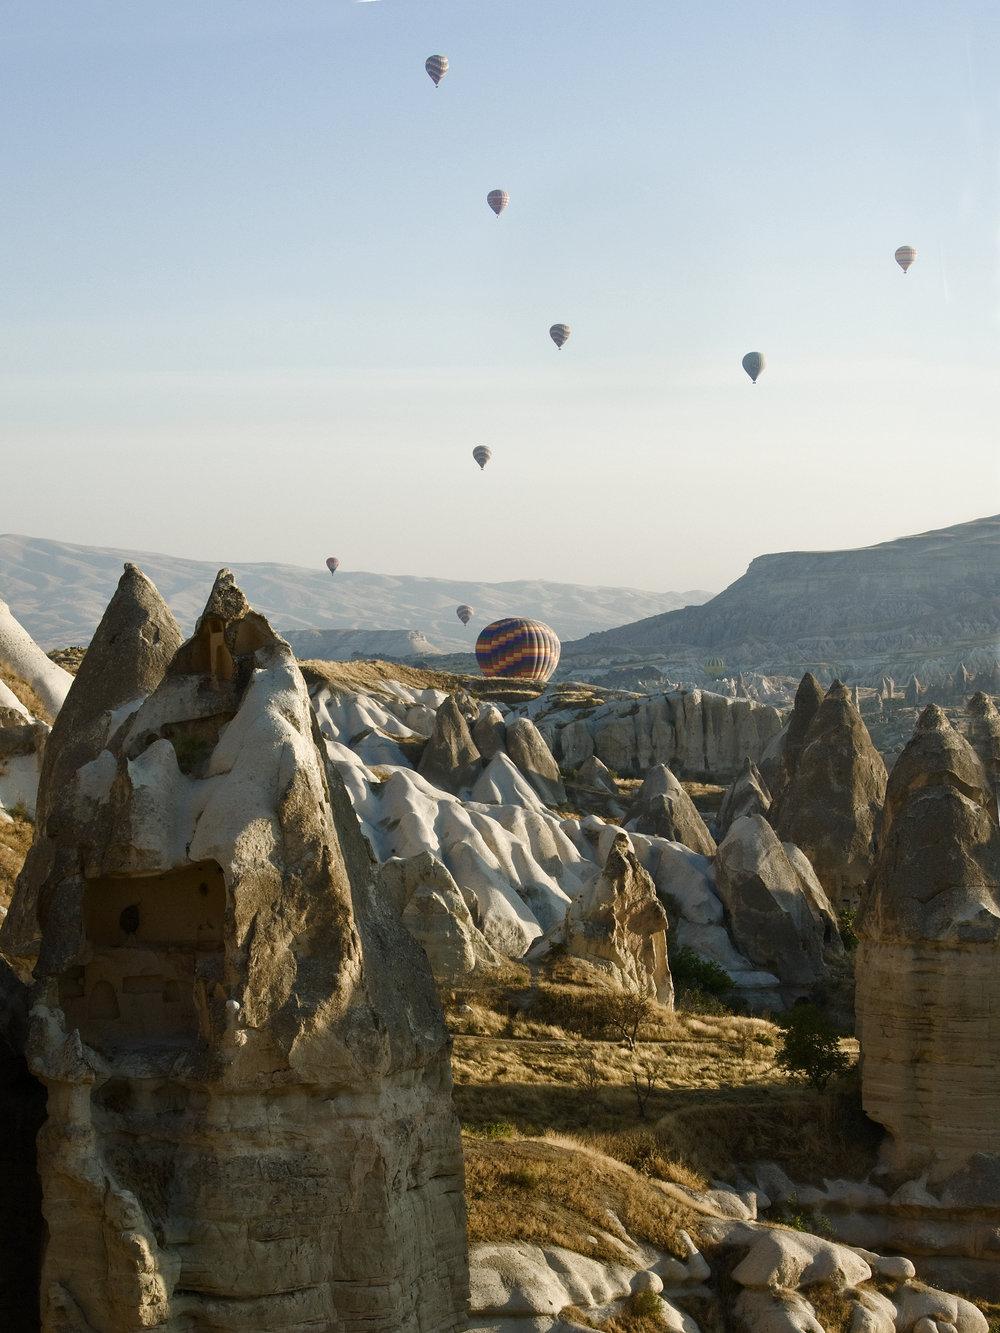 cappadocia108.jpg